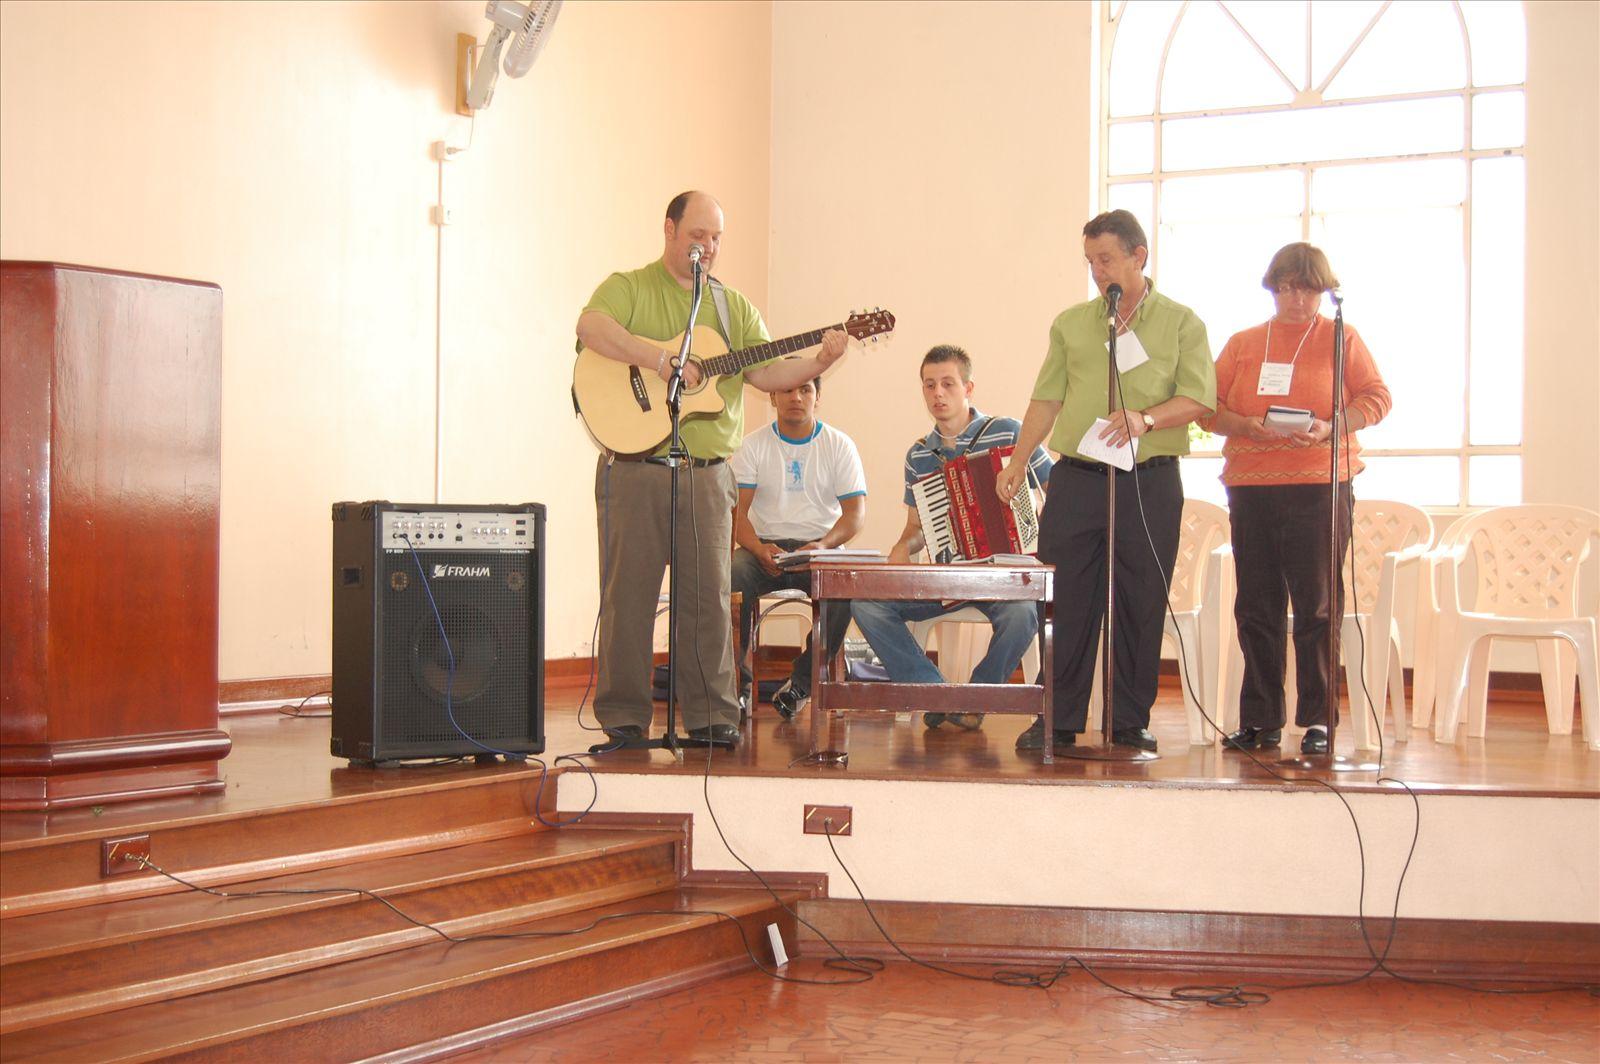 2º Encontro Família Cornelli - 11.10.2009 (140)_0